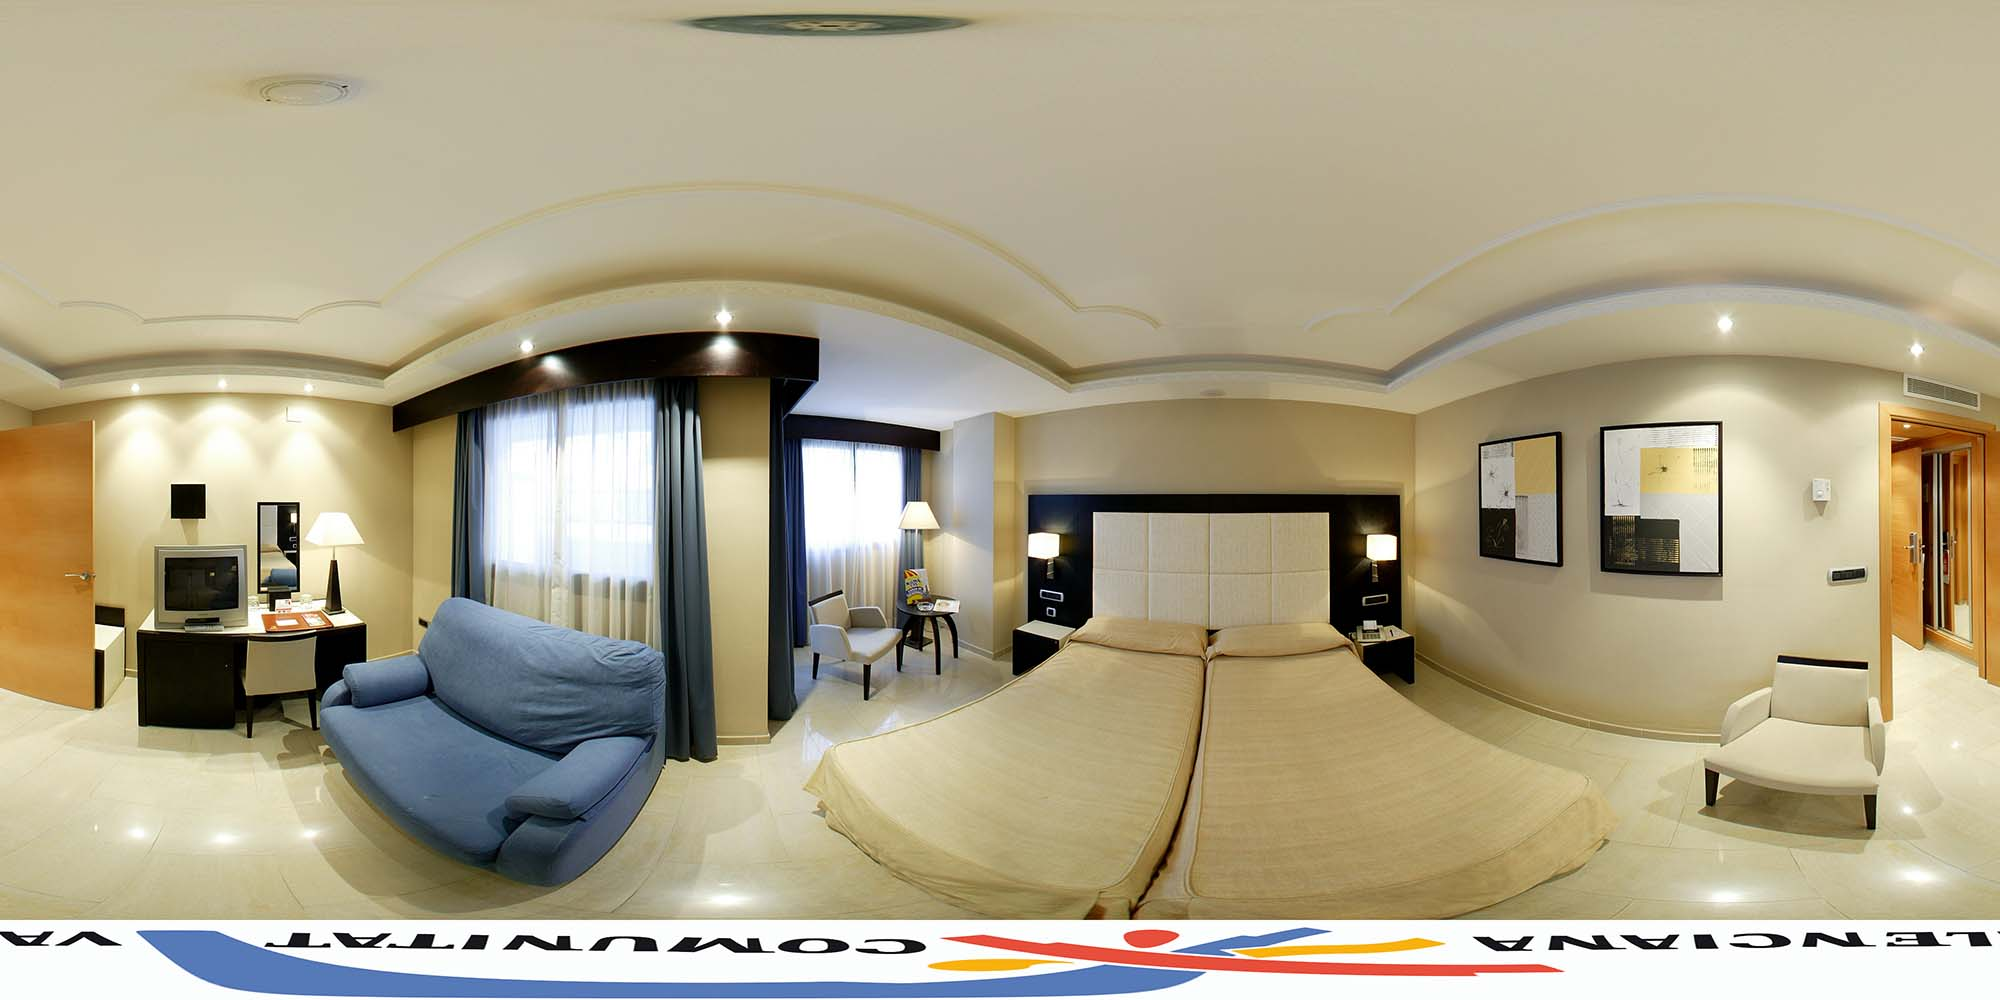 HOTEL MARINA D'OR PLAYA 4*